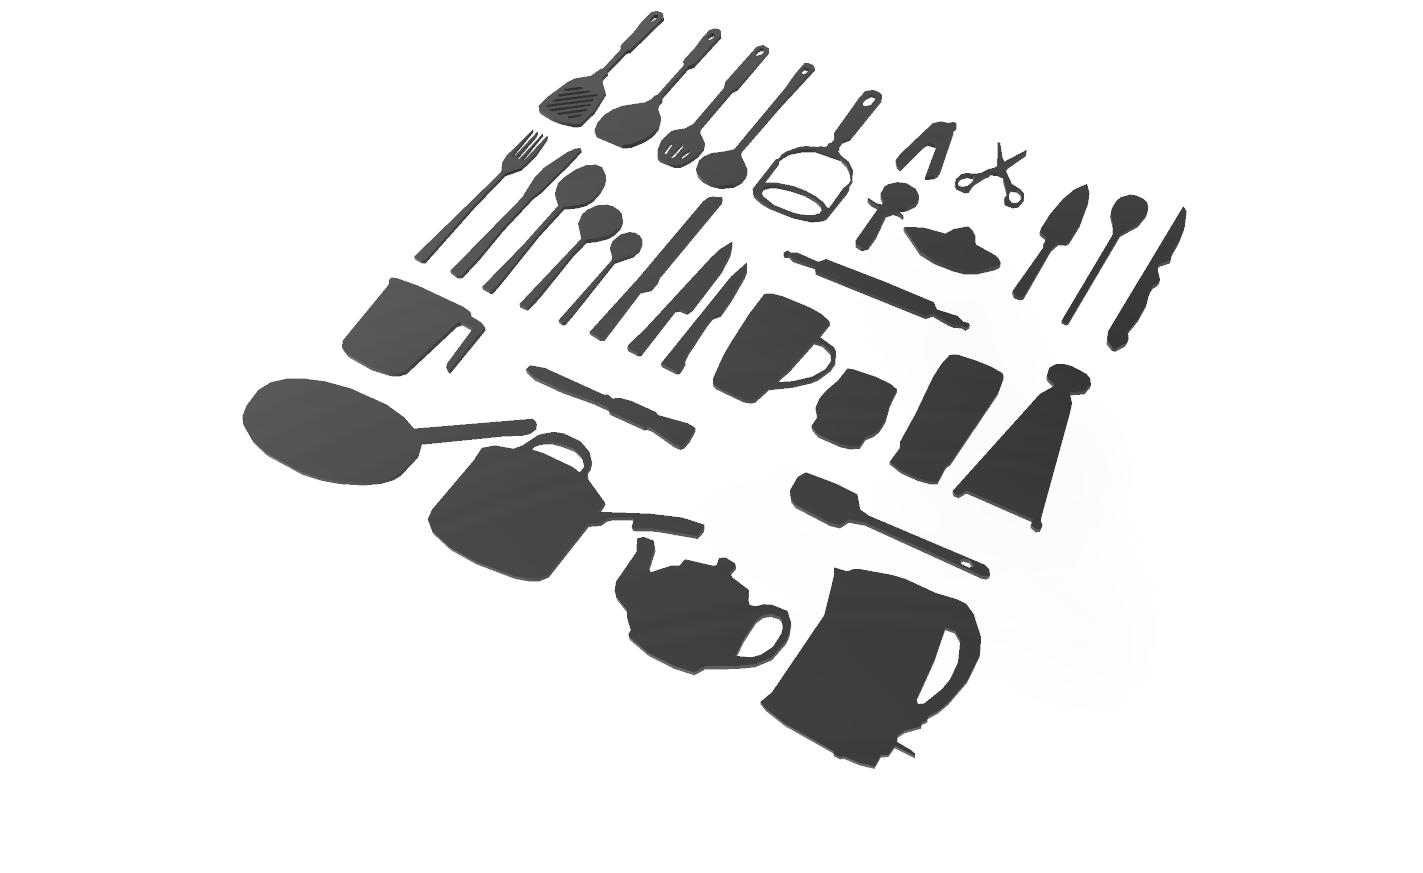 cuisine.png Download free STL file Kitchen utensil • Template to 3D print, motek